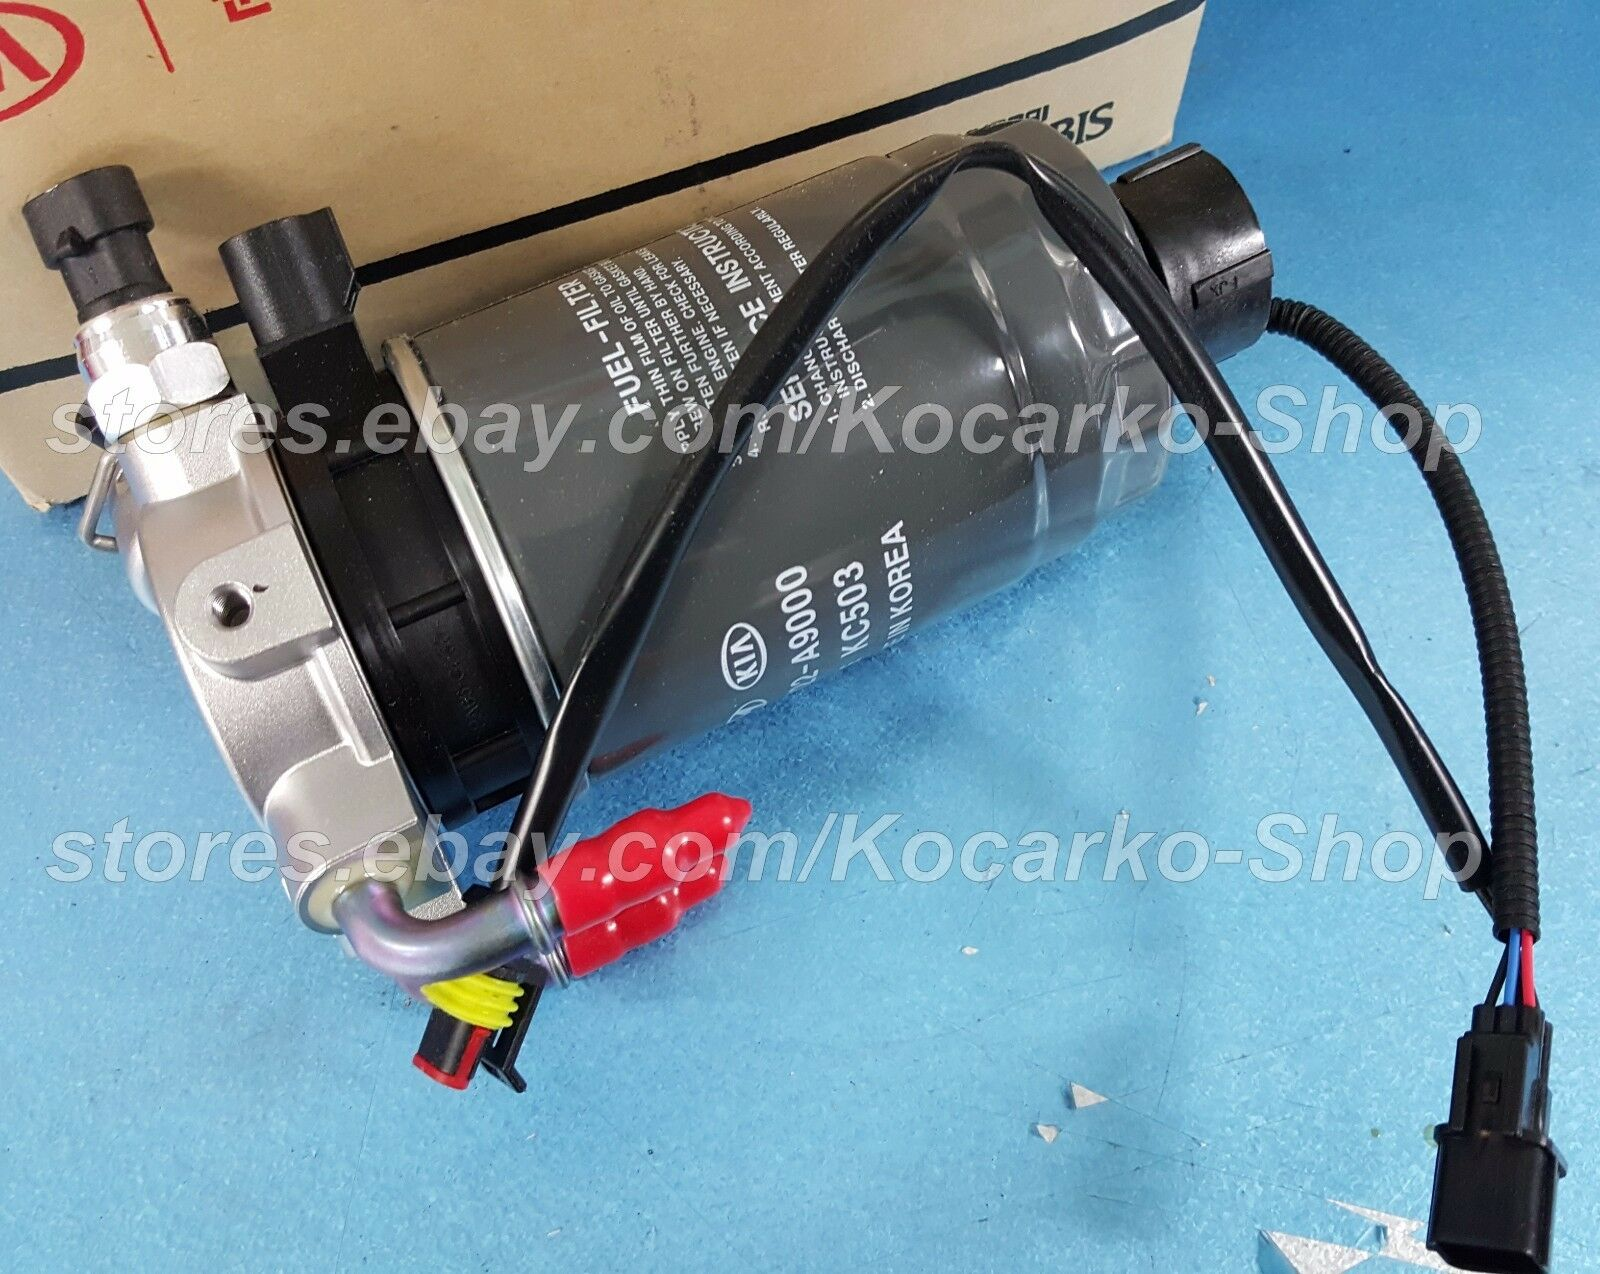 Filters Ebayshopkorea Discover Korea On Ebay 2012 Hyundai Elantra Fuel Filter Oem Diesel Engine Assy Kia All New Sorento Um 2015 31970c5900